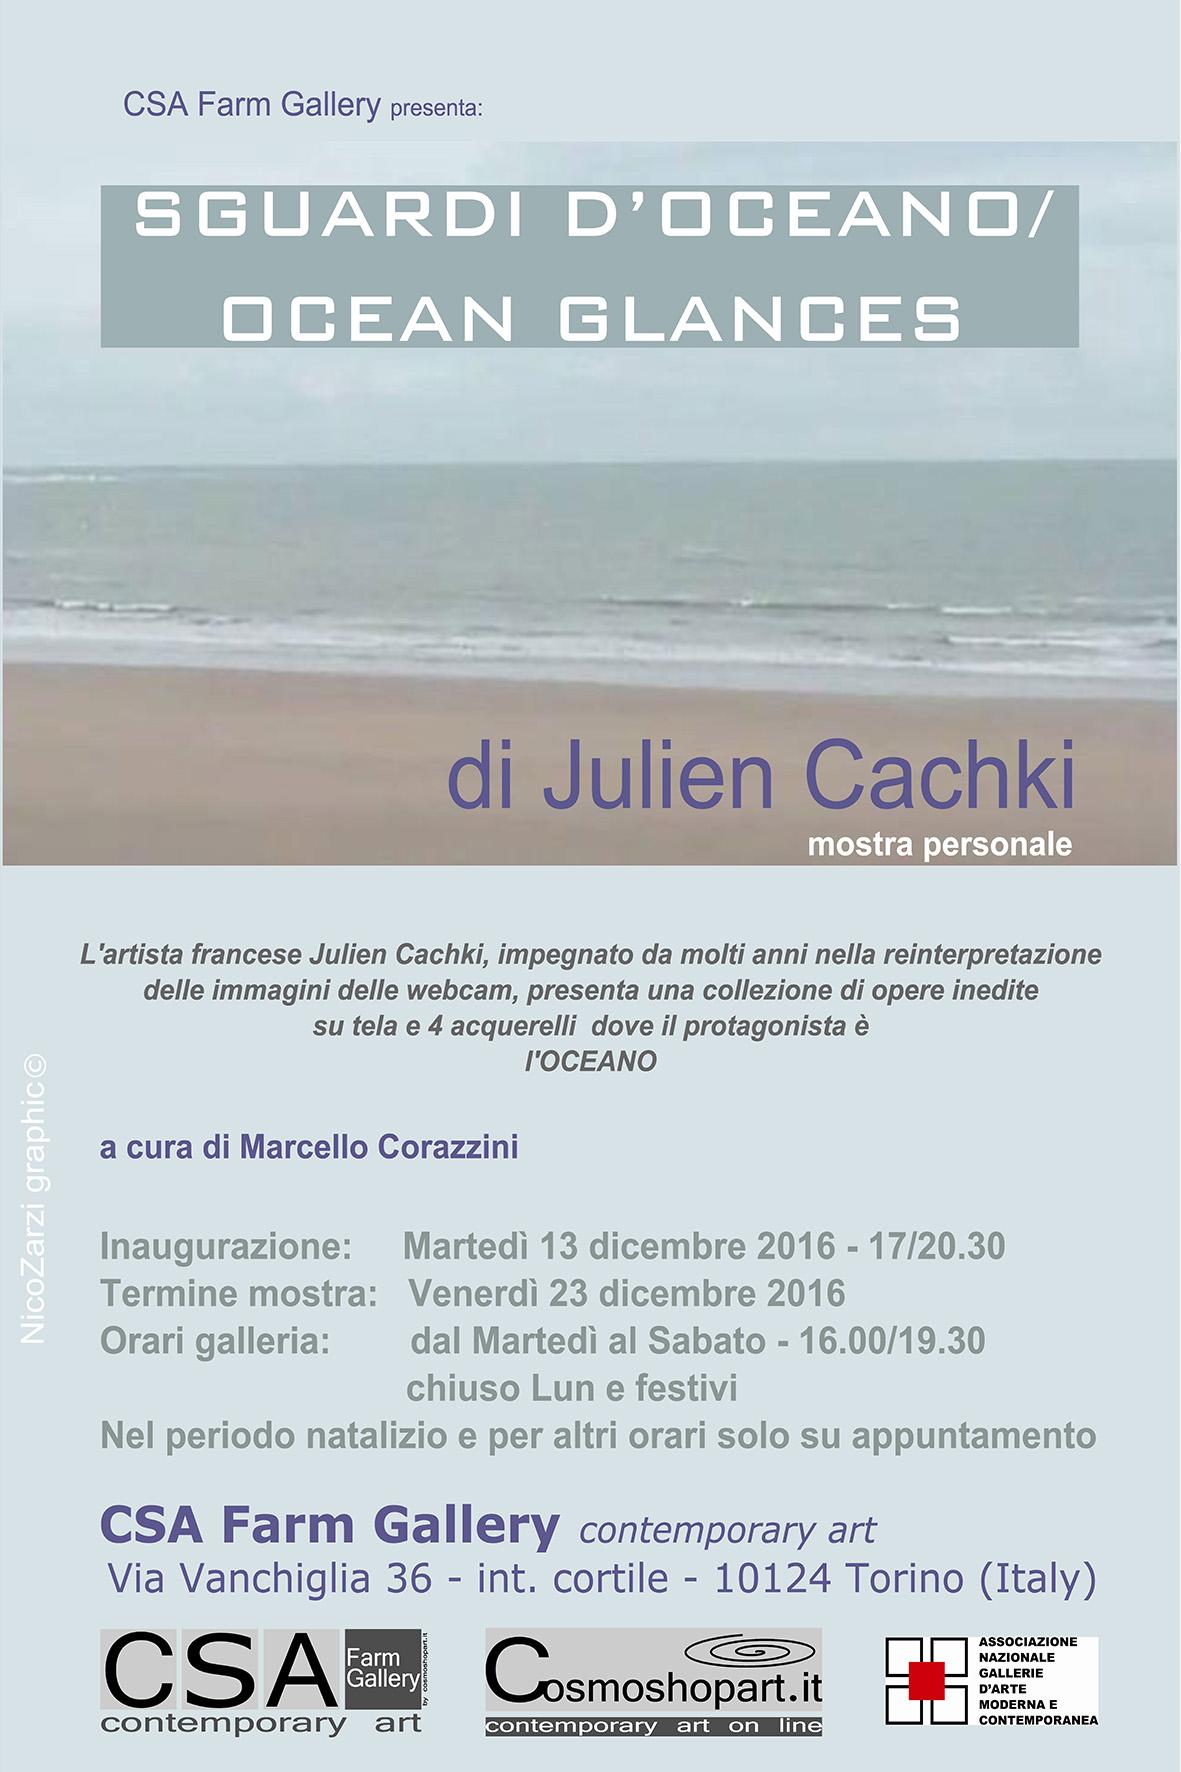 'Sguardi d'Oceano/Ocean Glances' di Julien Cachki, mostra personale, 13-23/12/2016 © J.Cachki/NicoZarzi/CSA